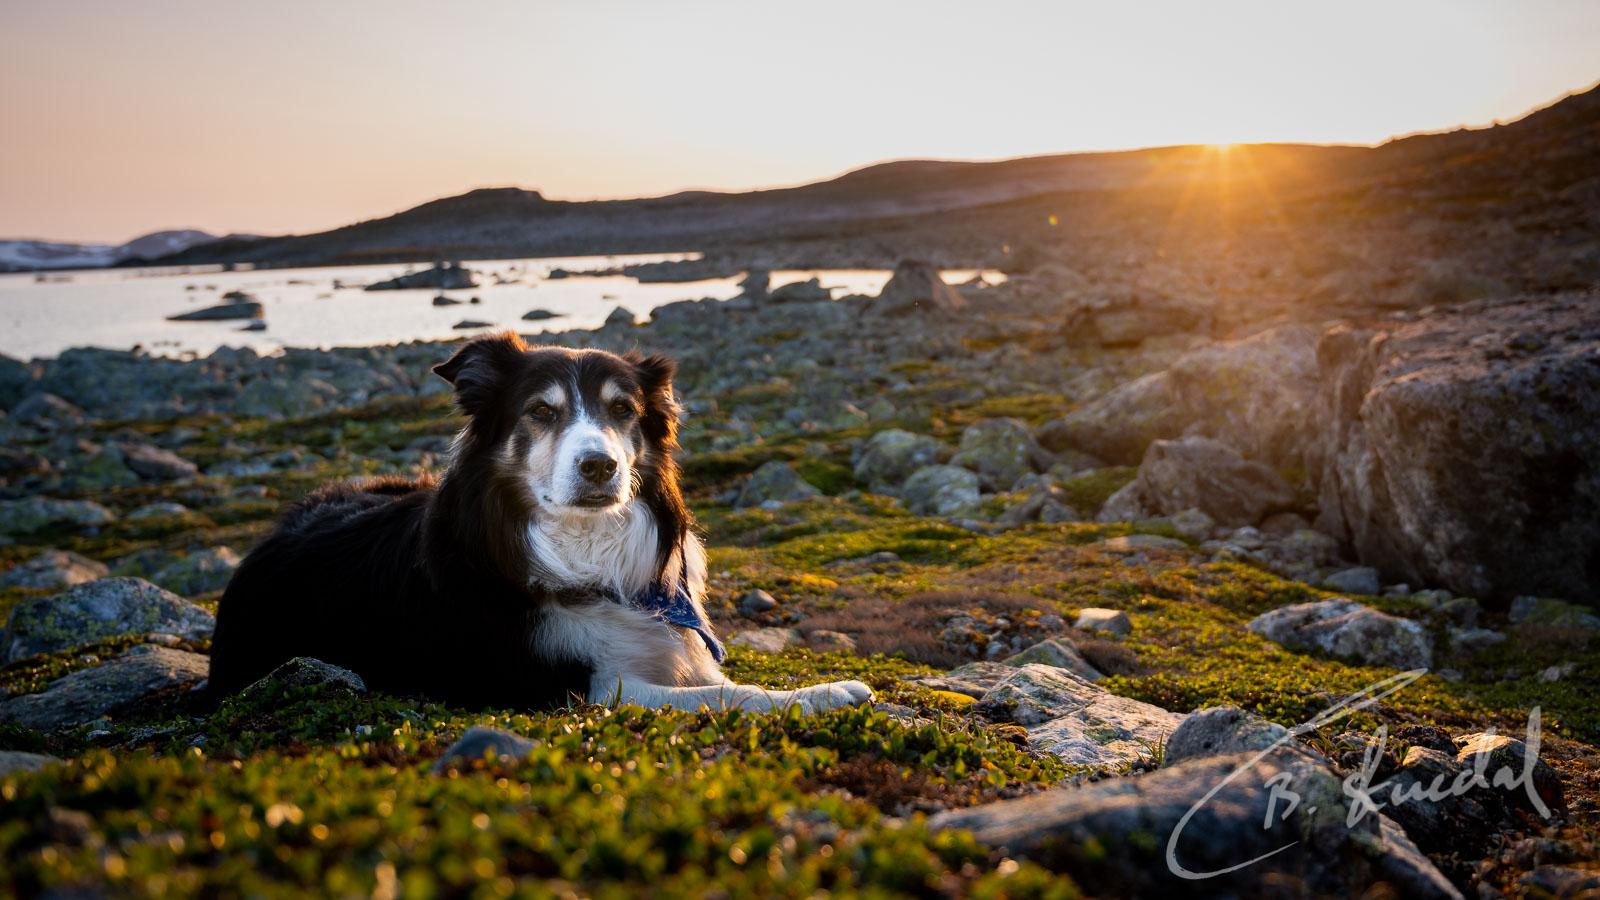 Dog in mountain sunset